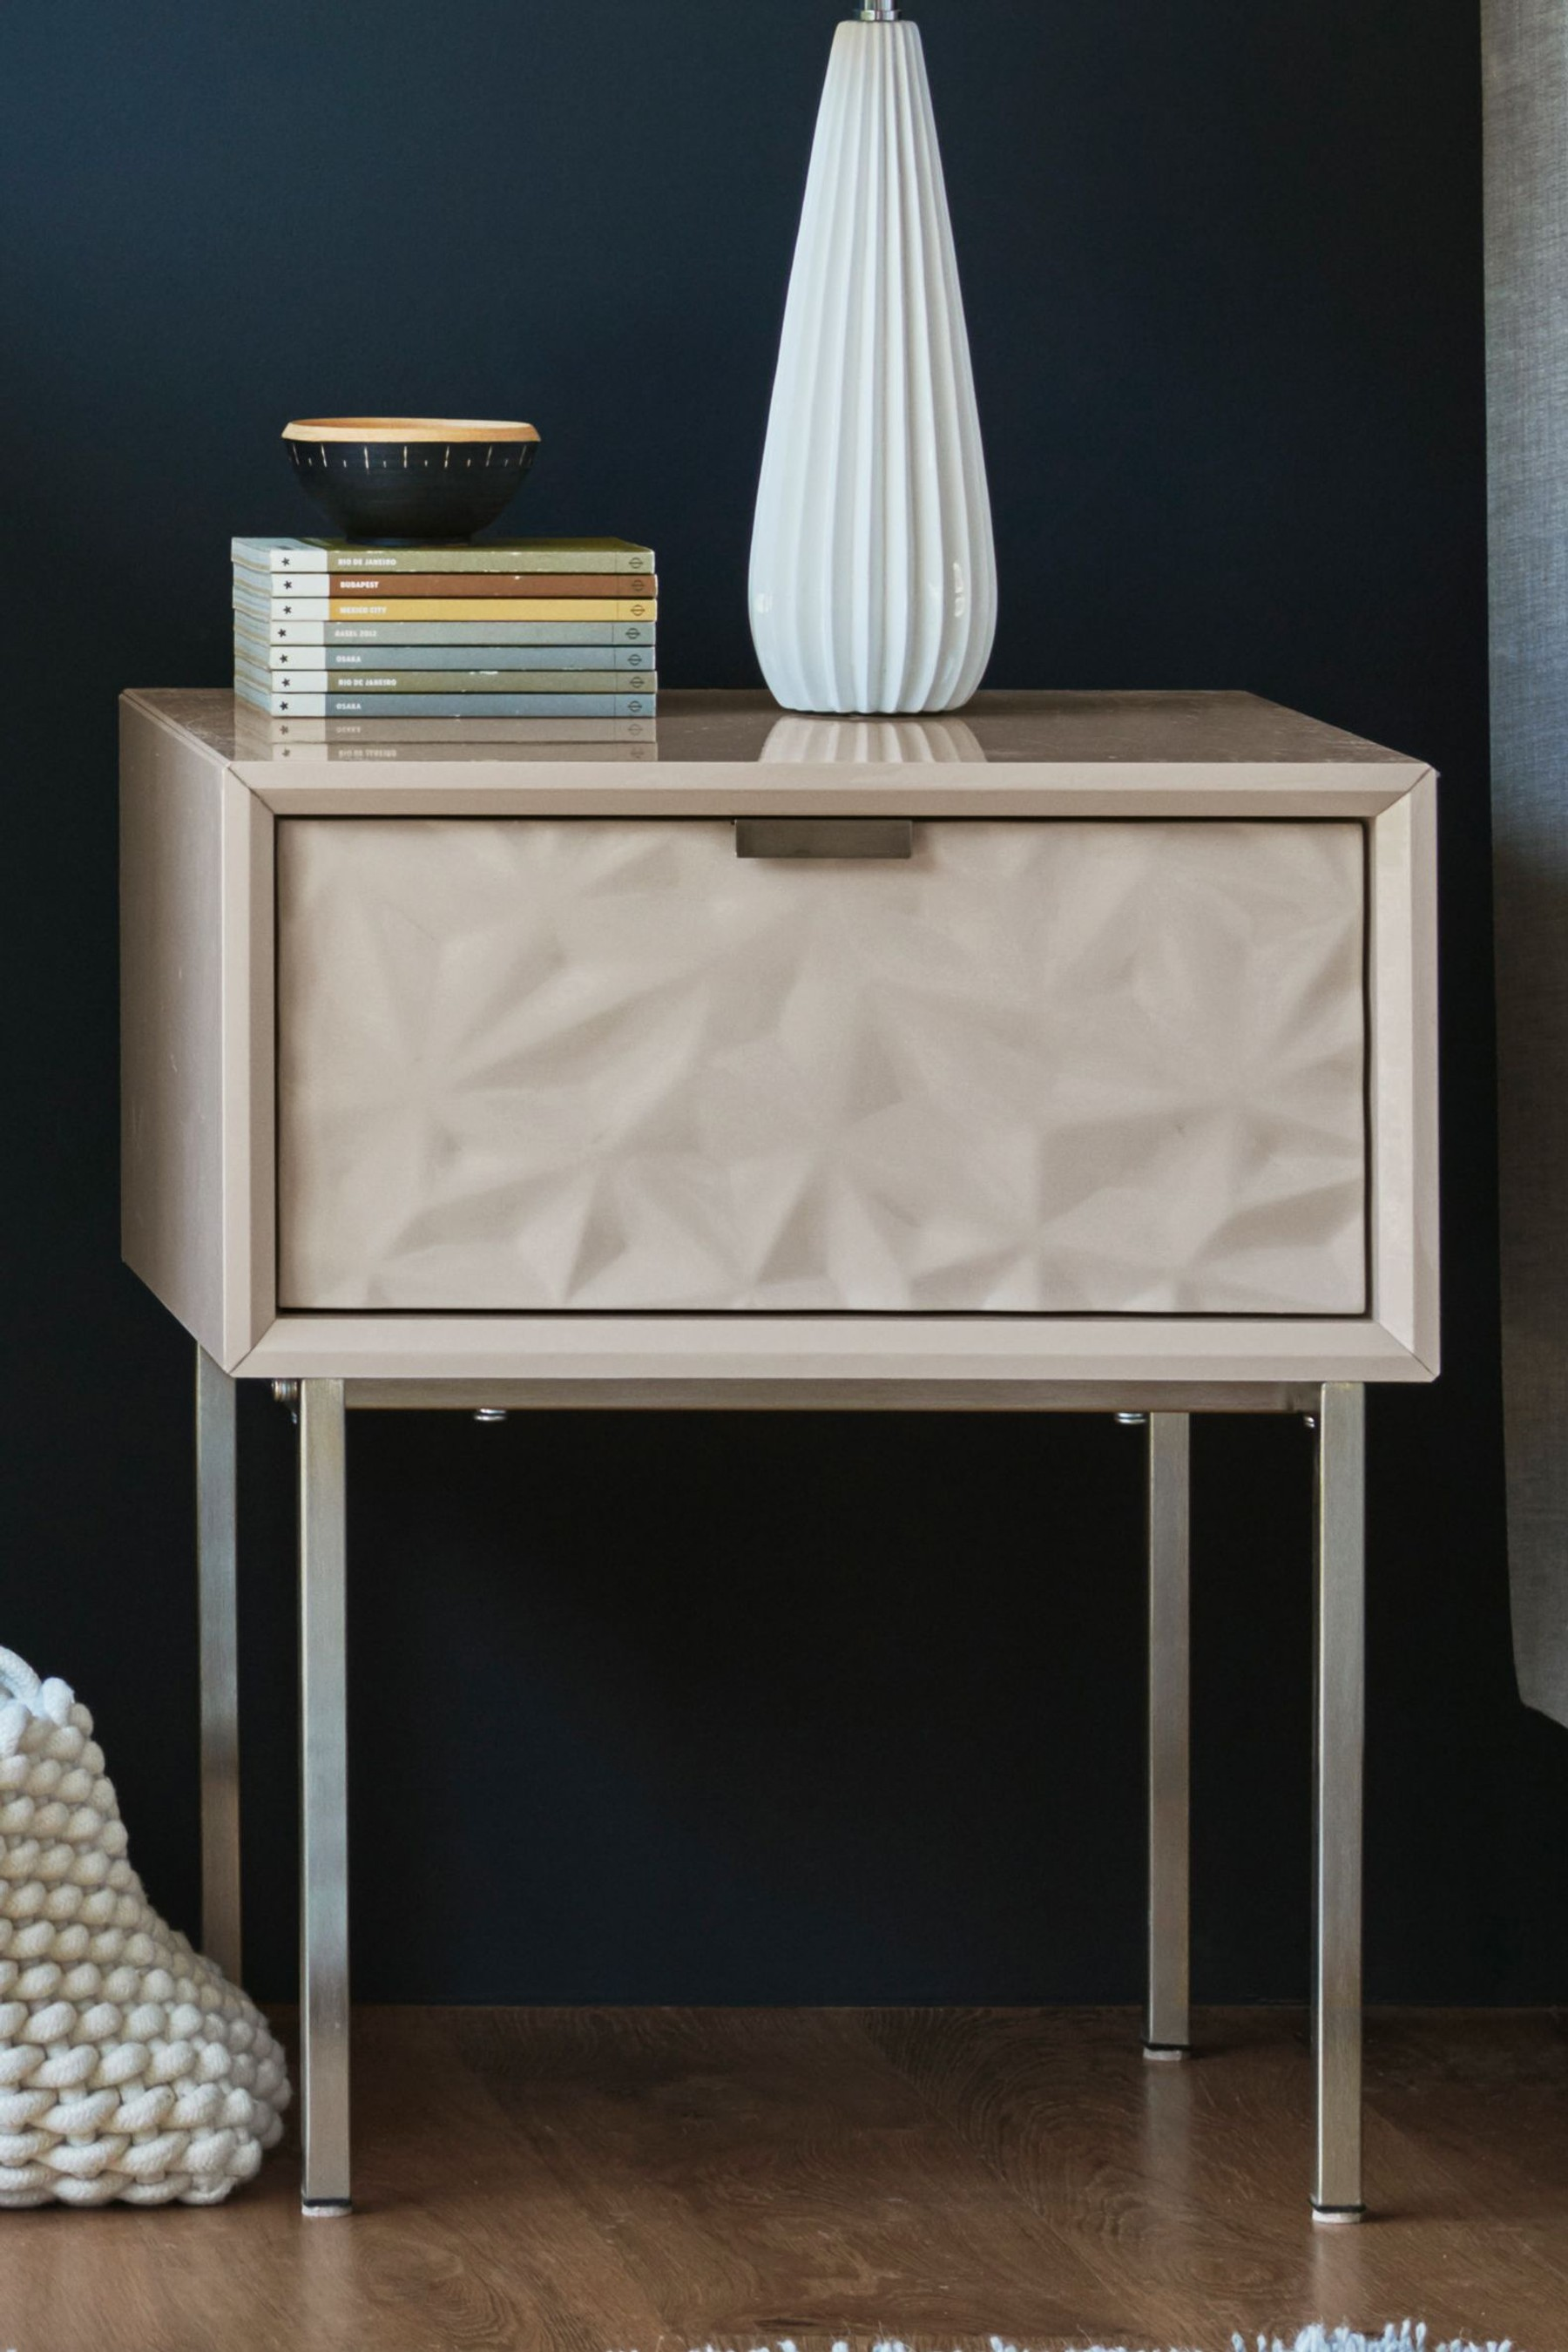 Next Mode Textured 1 Drawer Bedside Table Mink Bedroom Collections Furniture Furniture Mattress Furniture